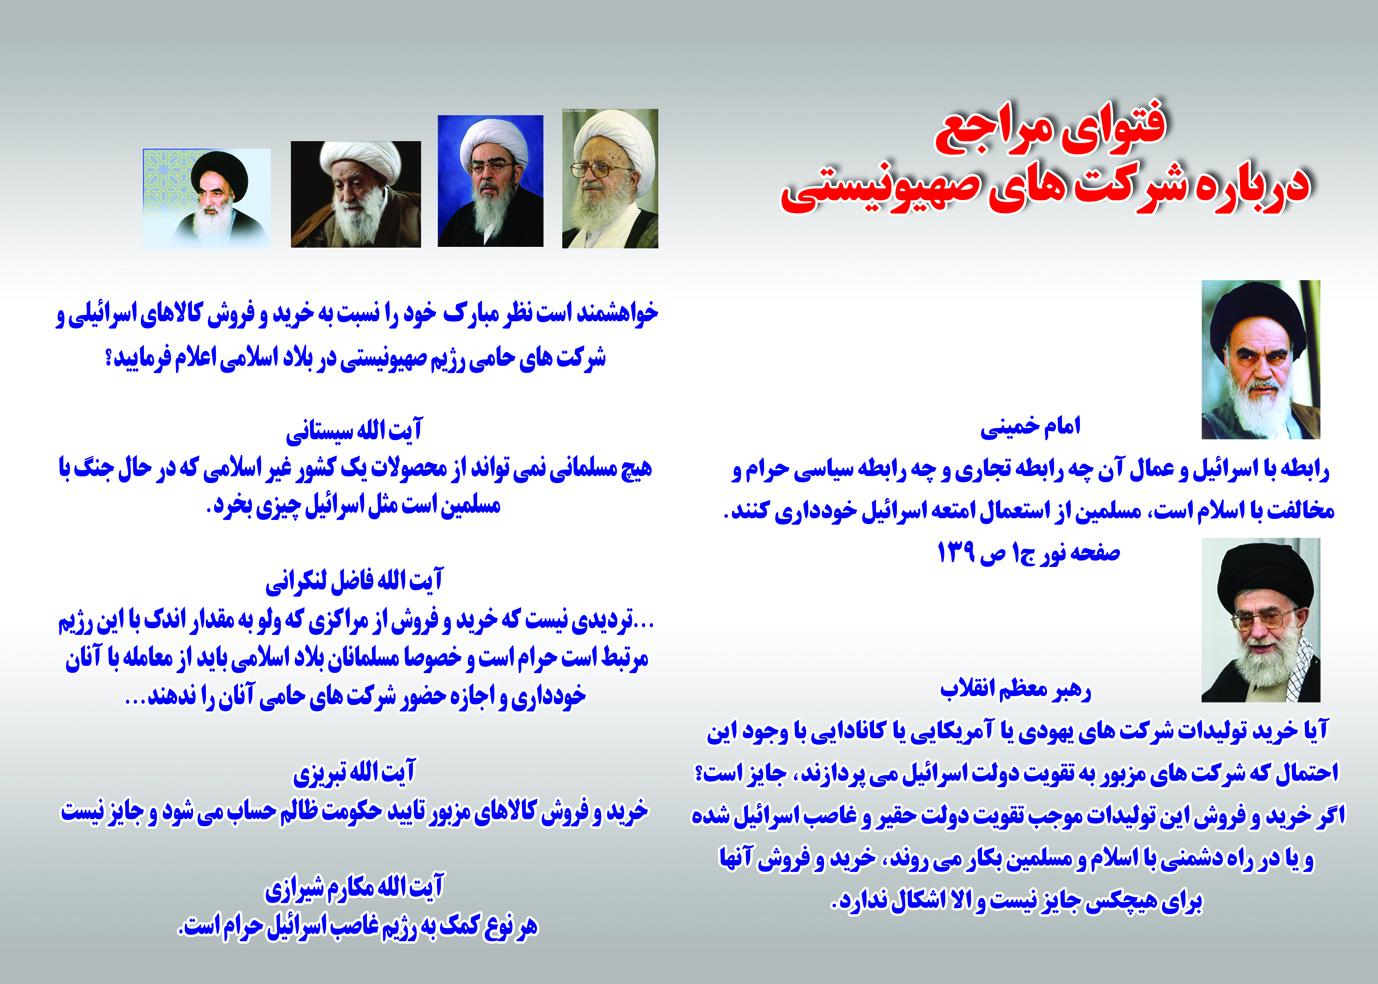 http://sobhegharib3.persiangig.com/image/namayeshgah/a3.jpg